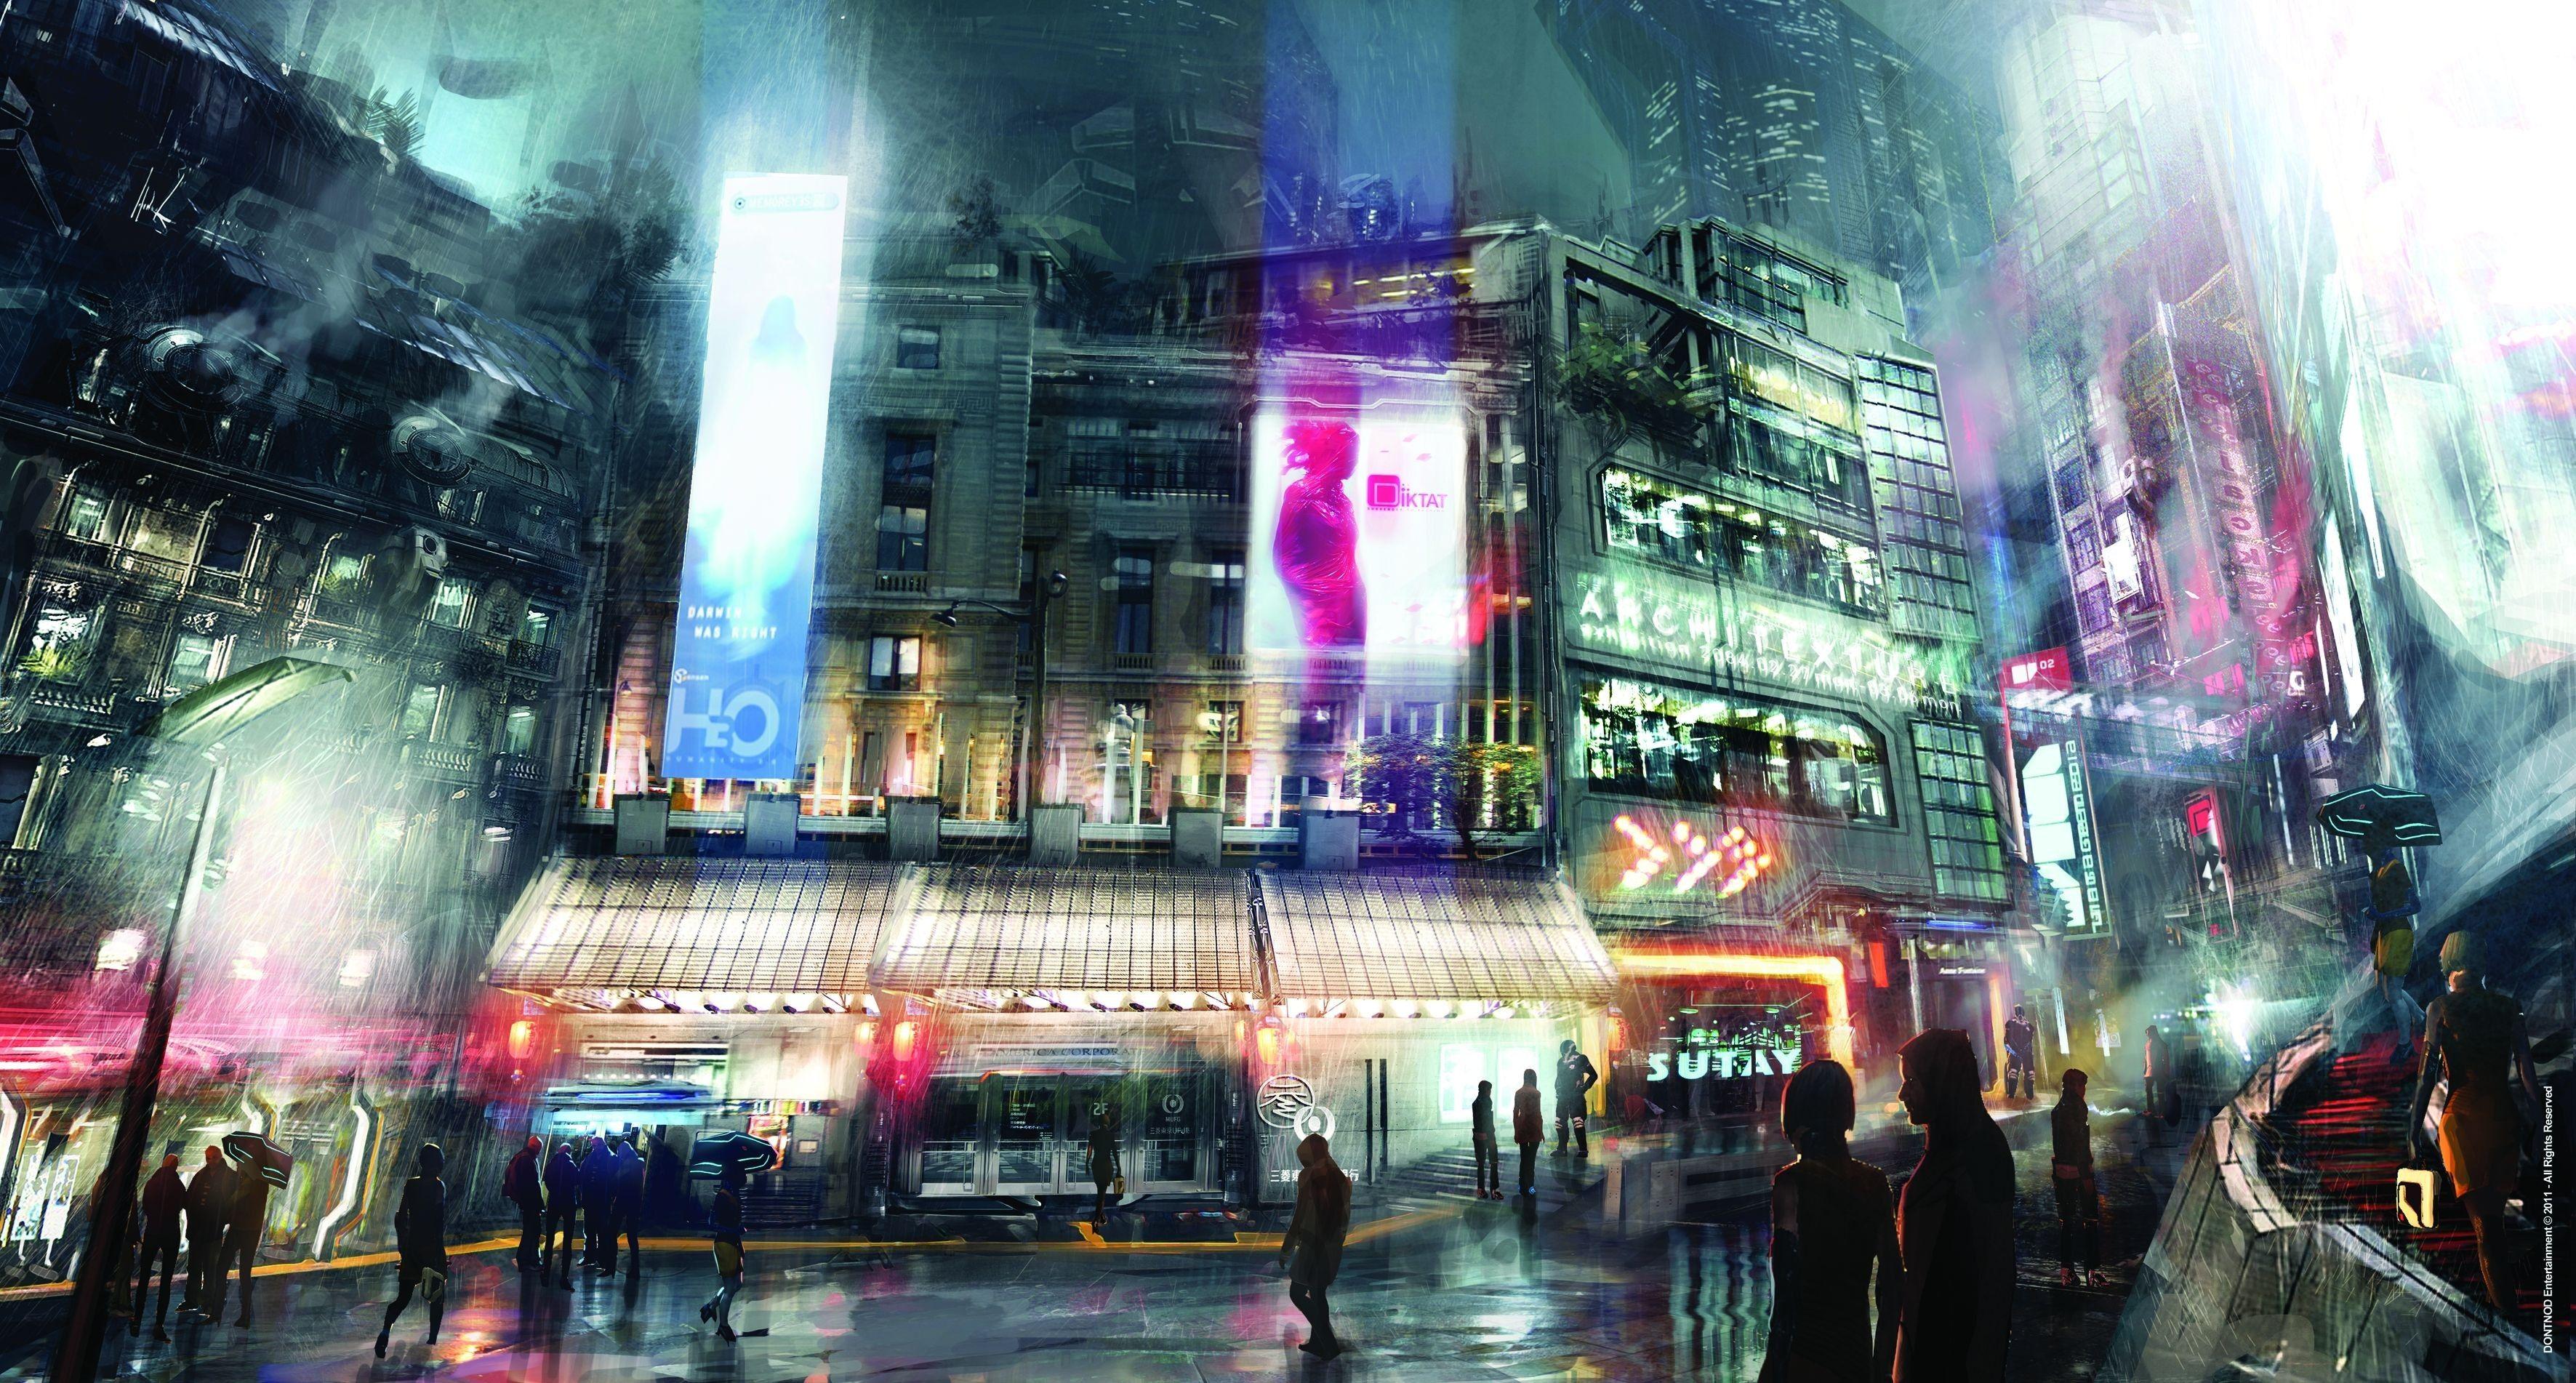 Cyberpunk Hd Wallpapers Backgrounds Wallpaper Futuristic City Cyberpunk City Anime City